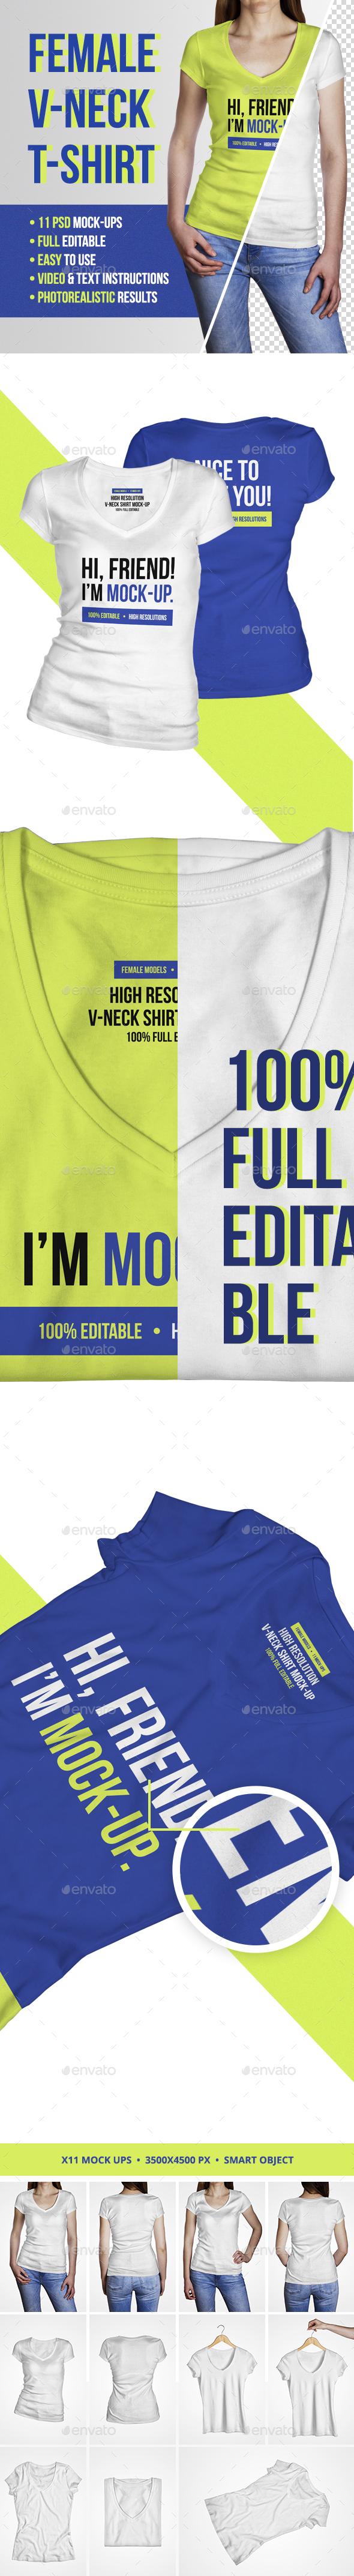 Female V Neck T-Shirt Mockup - T-shirts Apparel